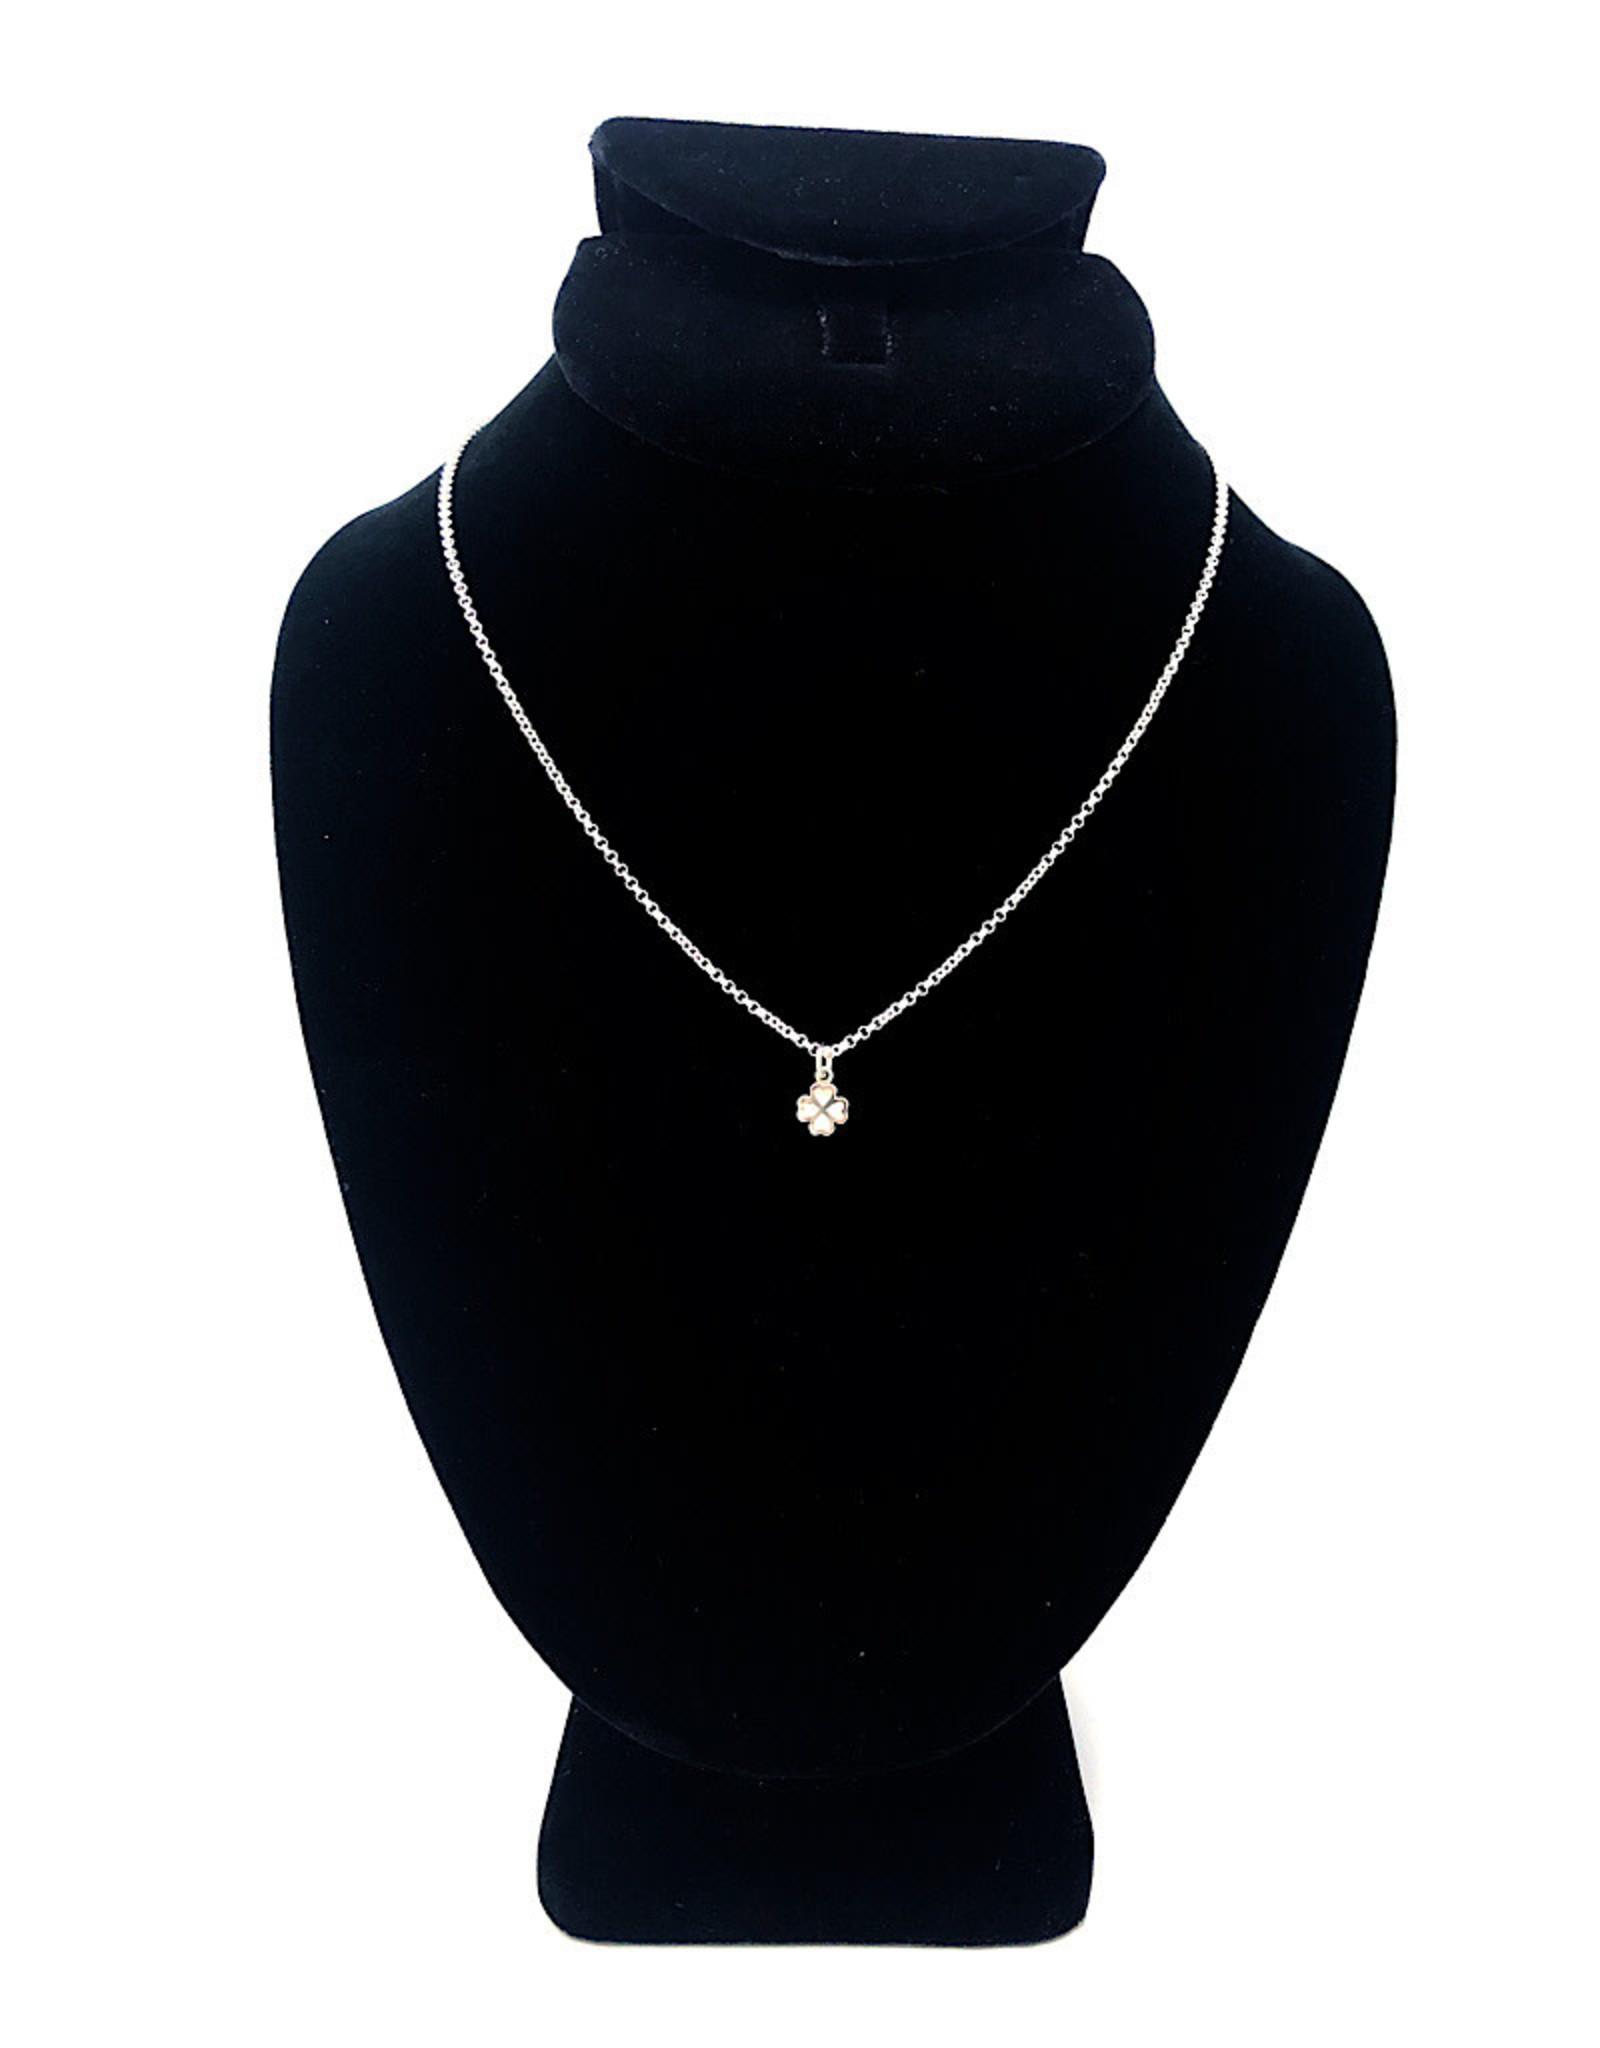 Beblue Silver Necklace Clover